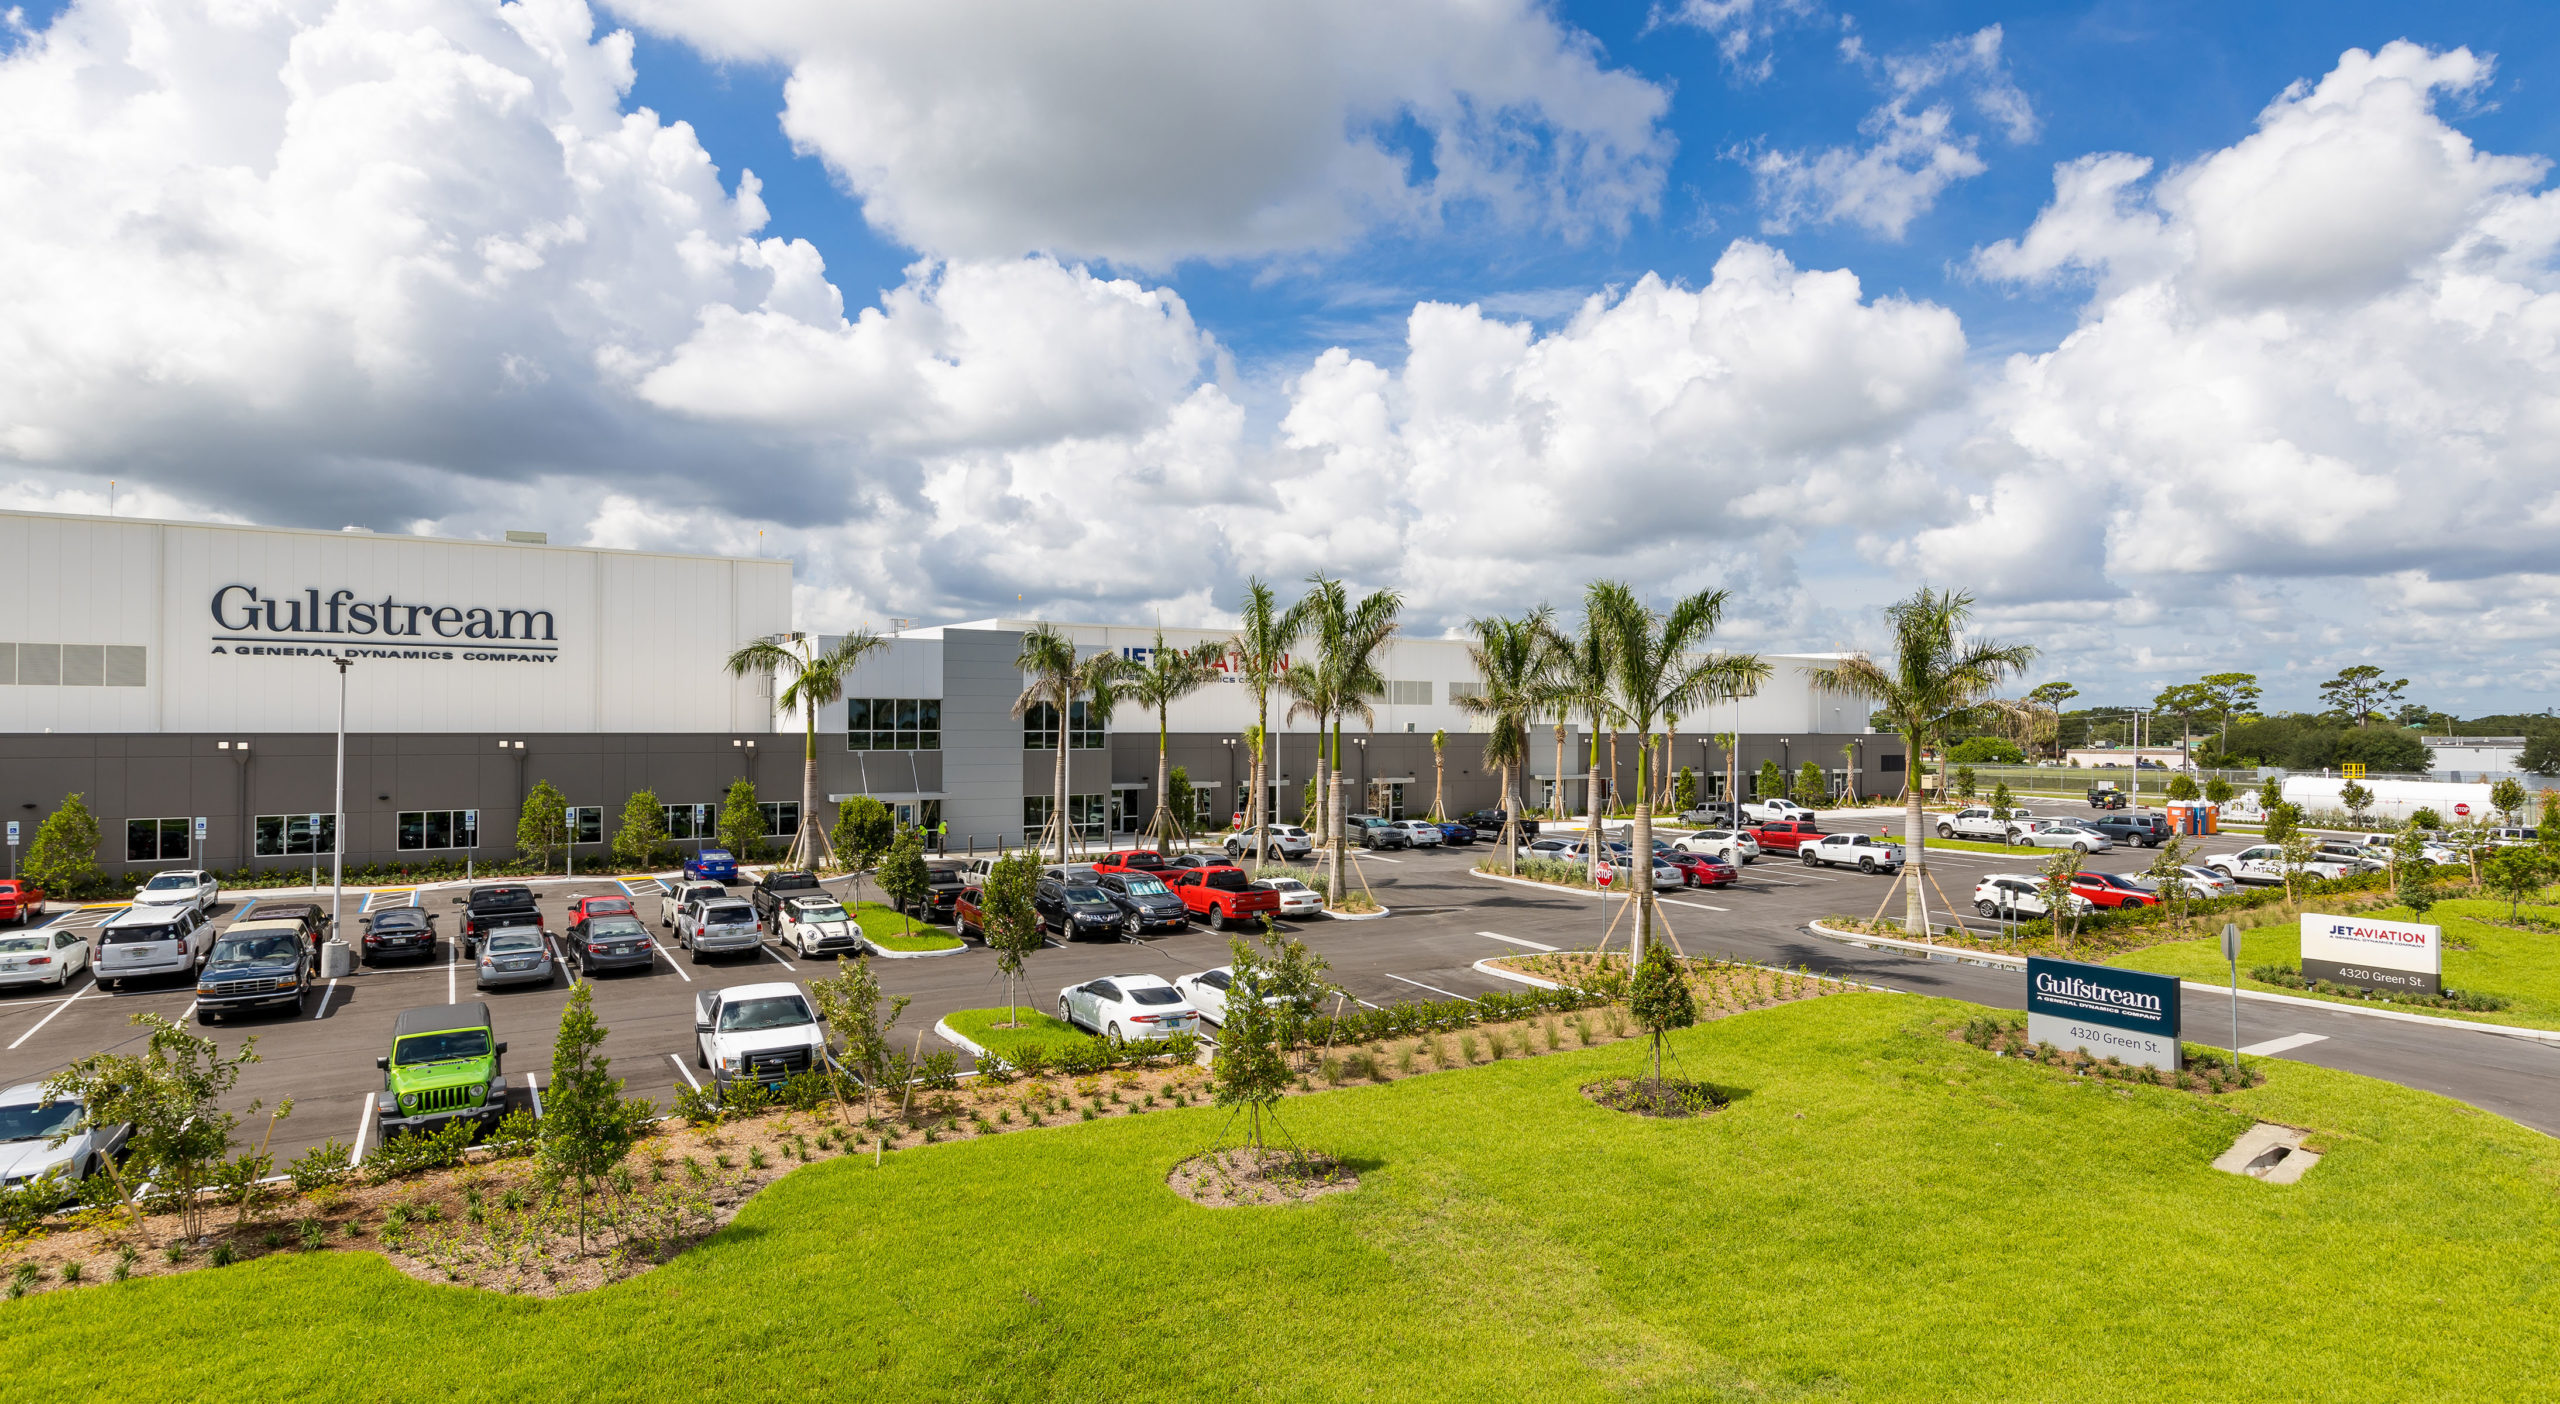 Gulfstream Opens New Palm Beach Service Center